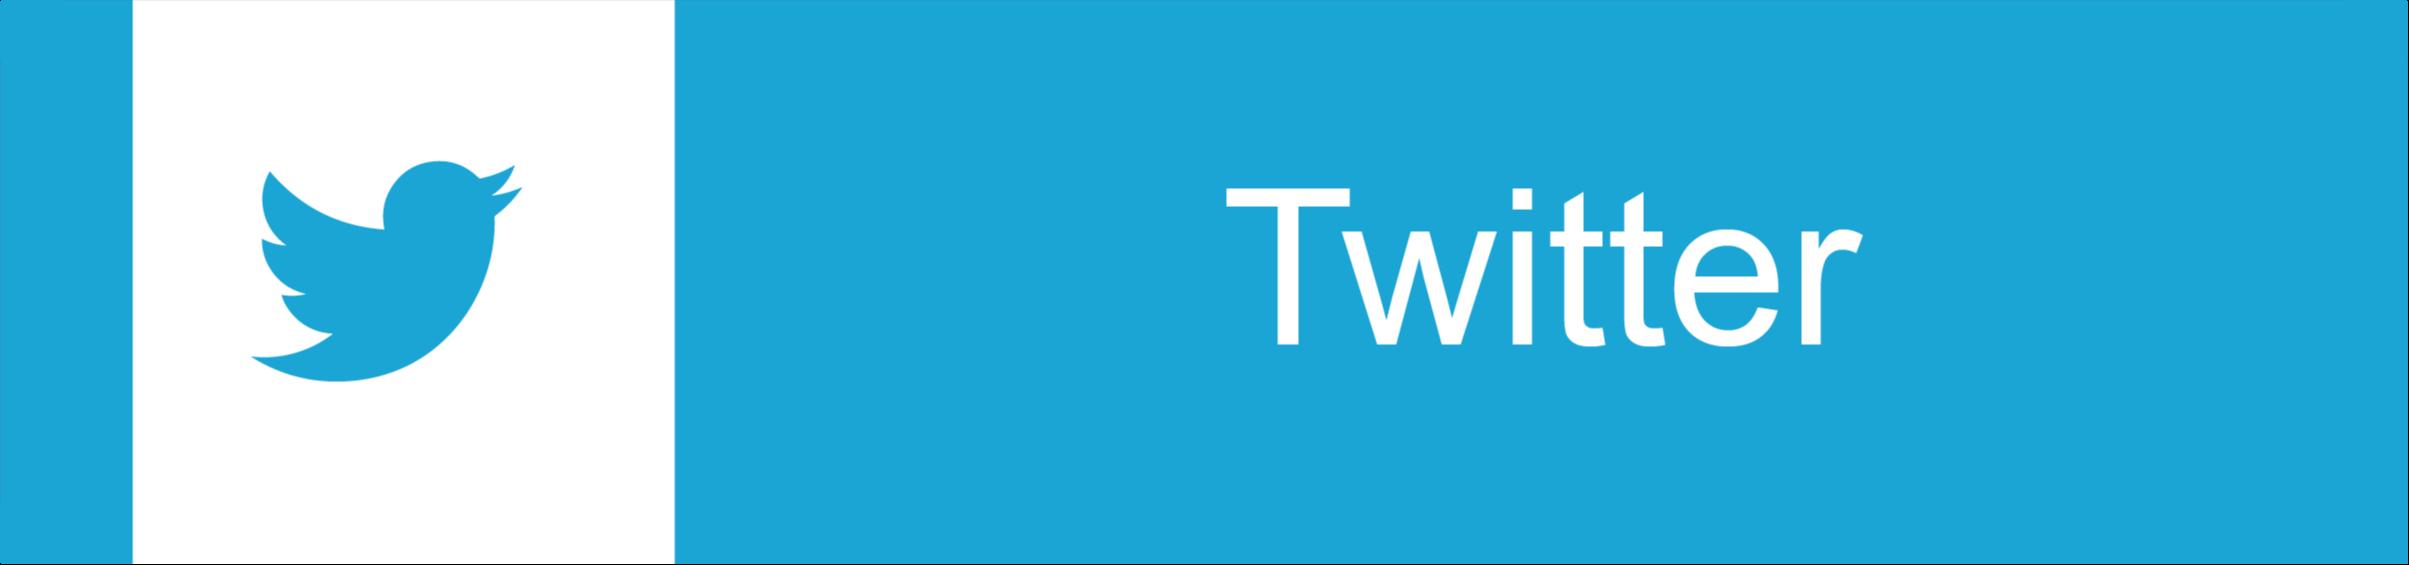 Twitter - Digital Design